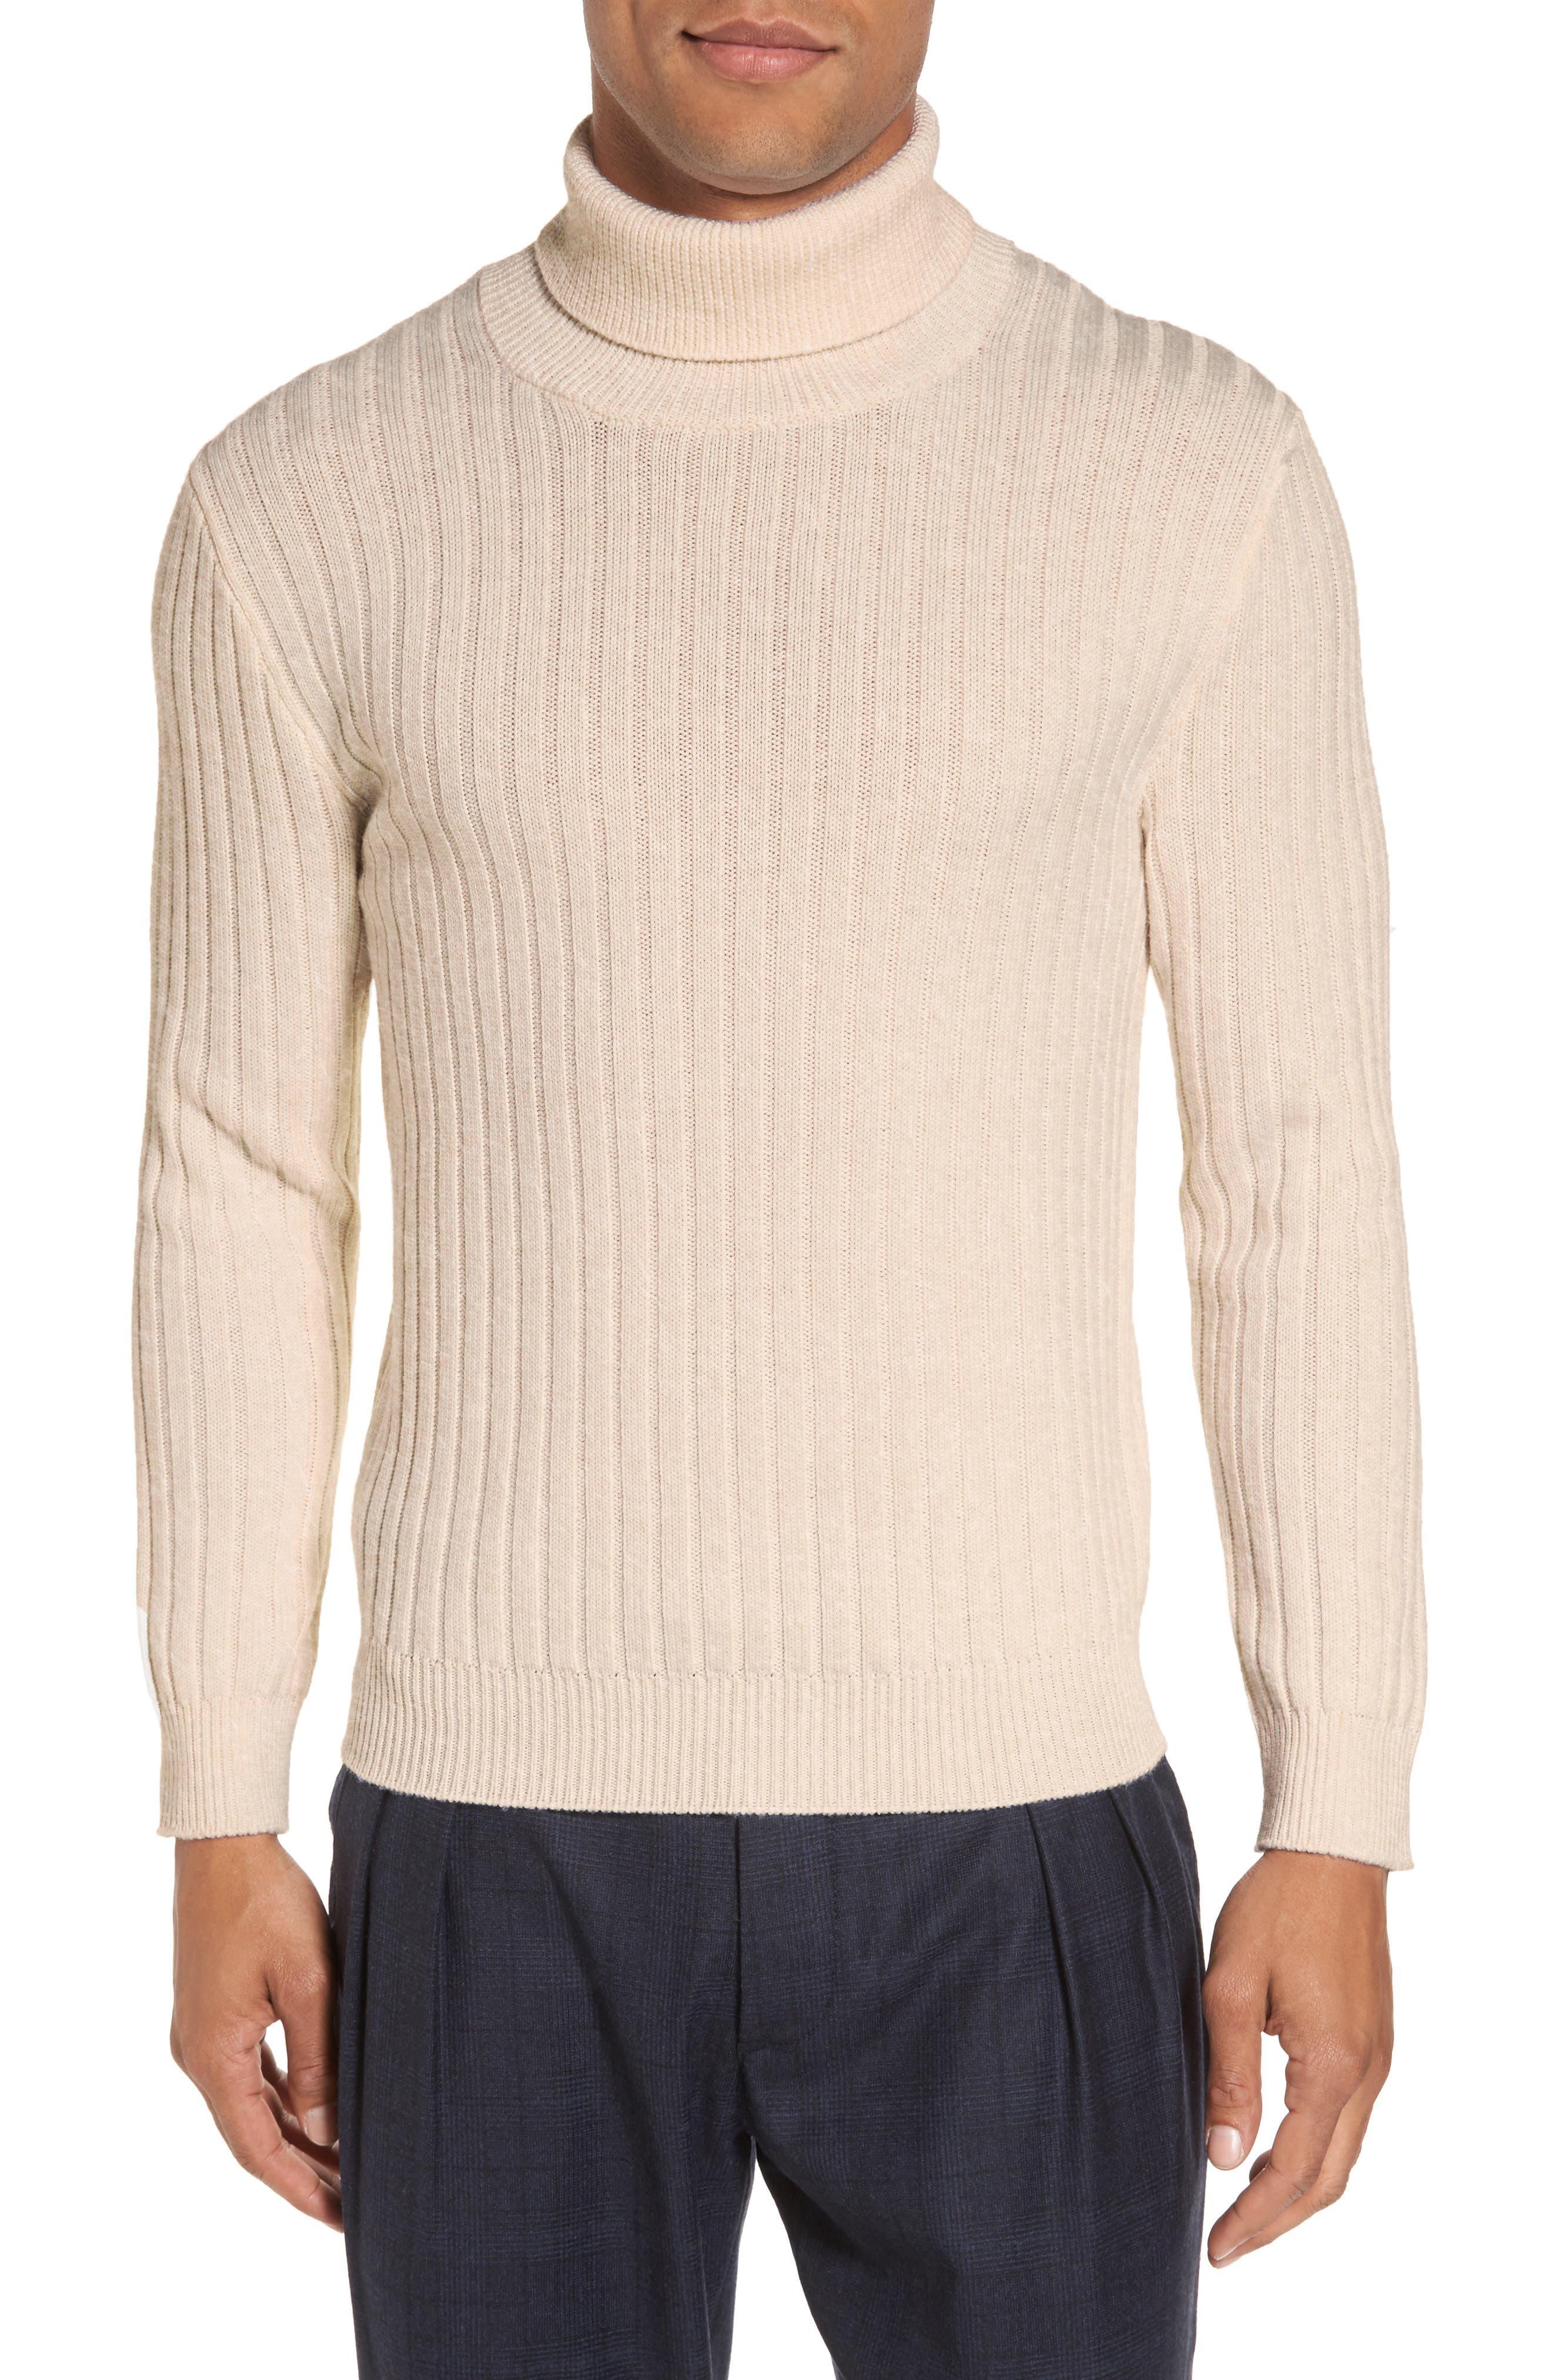 Main Image - Eleventy Ribbed Turtleneck Wool Sweater